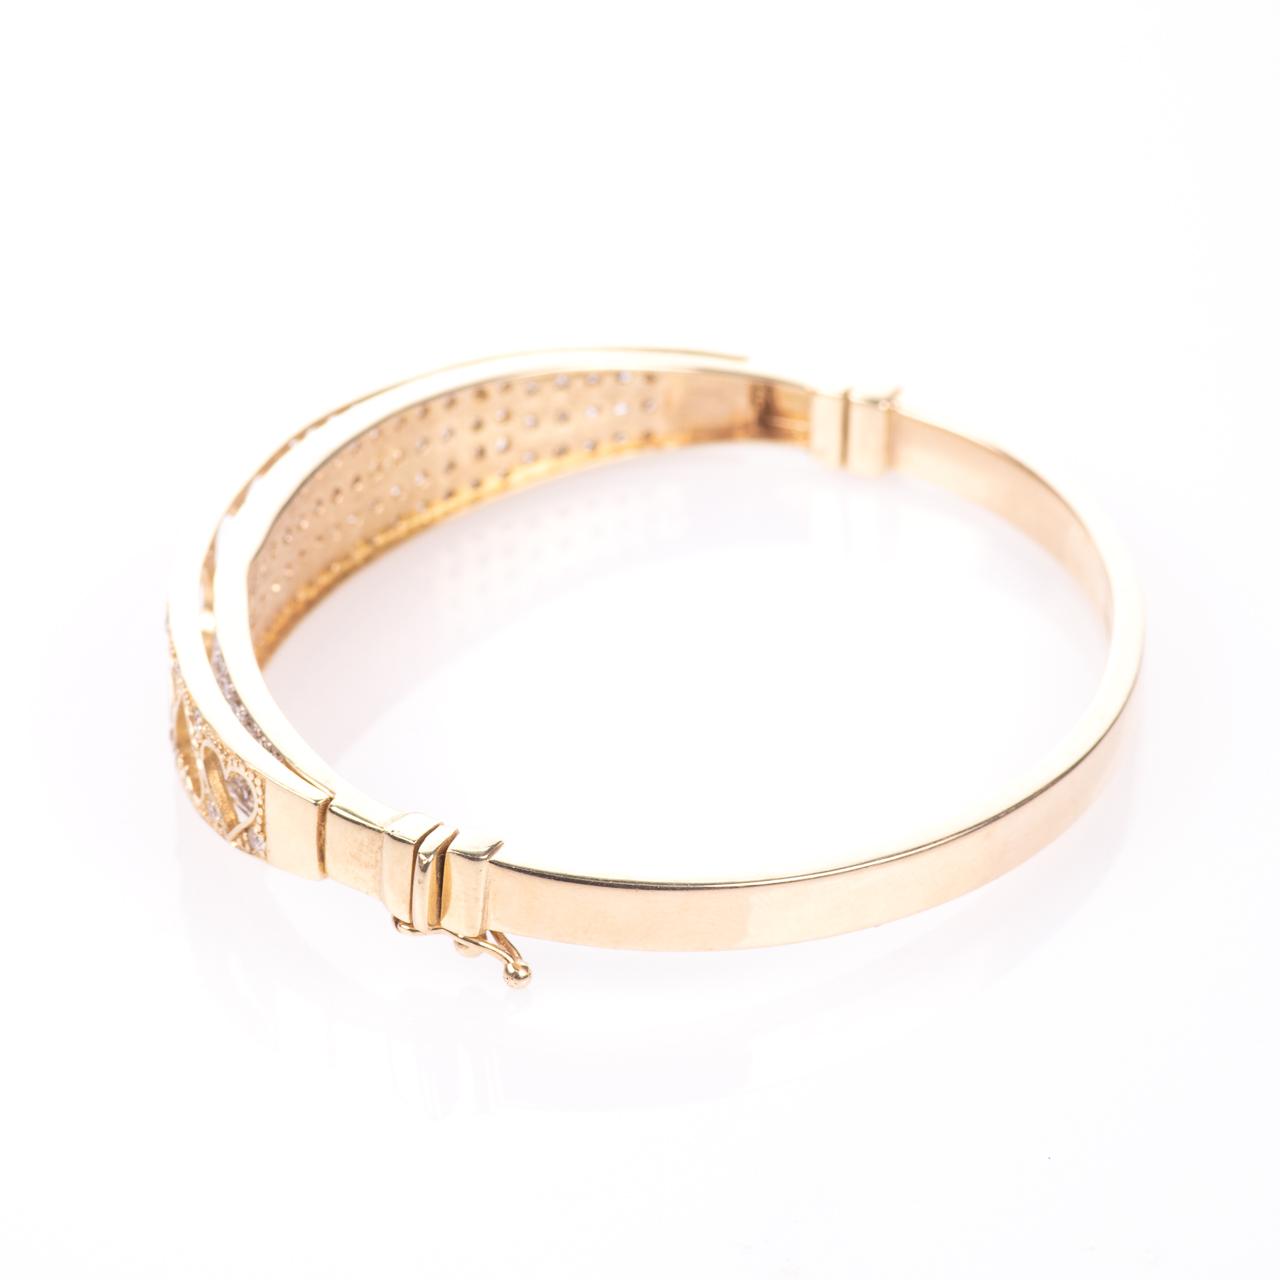 9ct Gold 4ct Diamond Heart Bangle Bracelet - Image 5 of 7